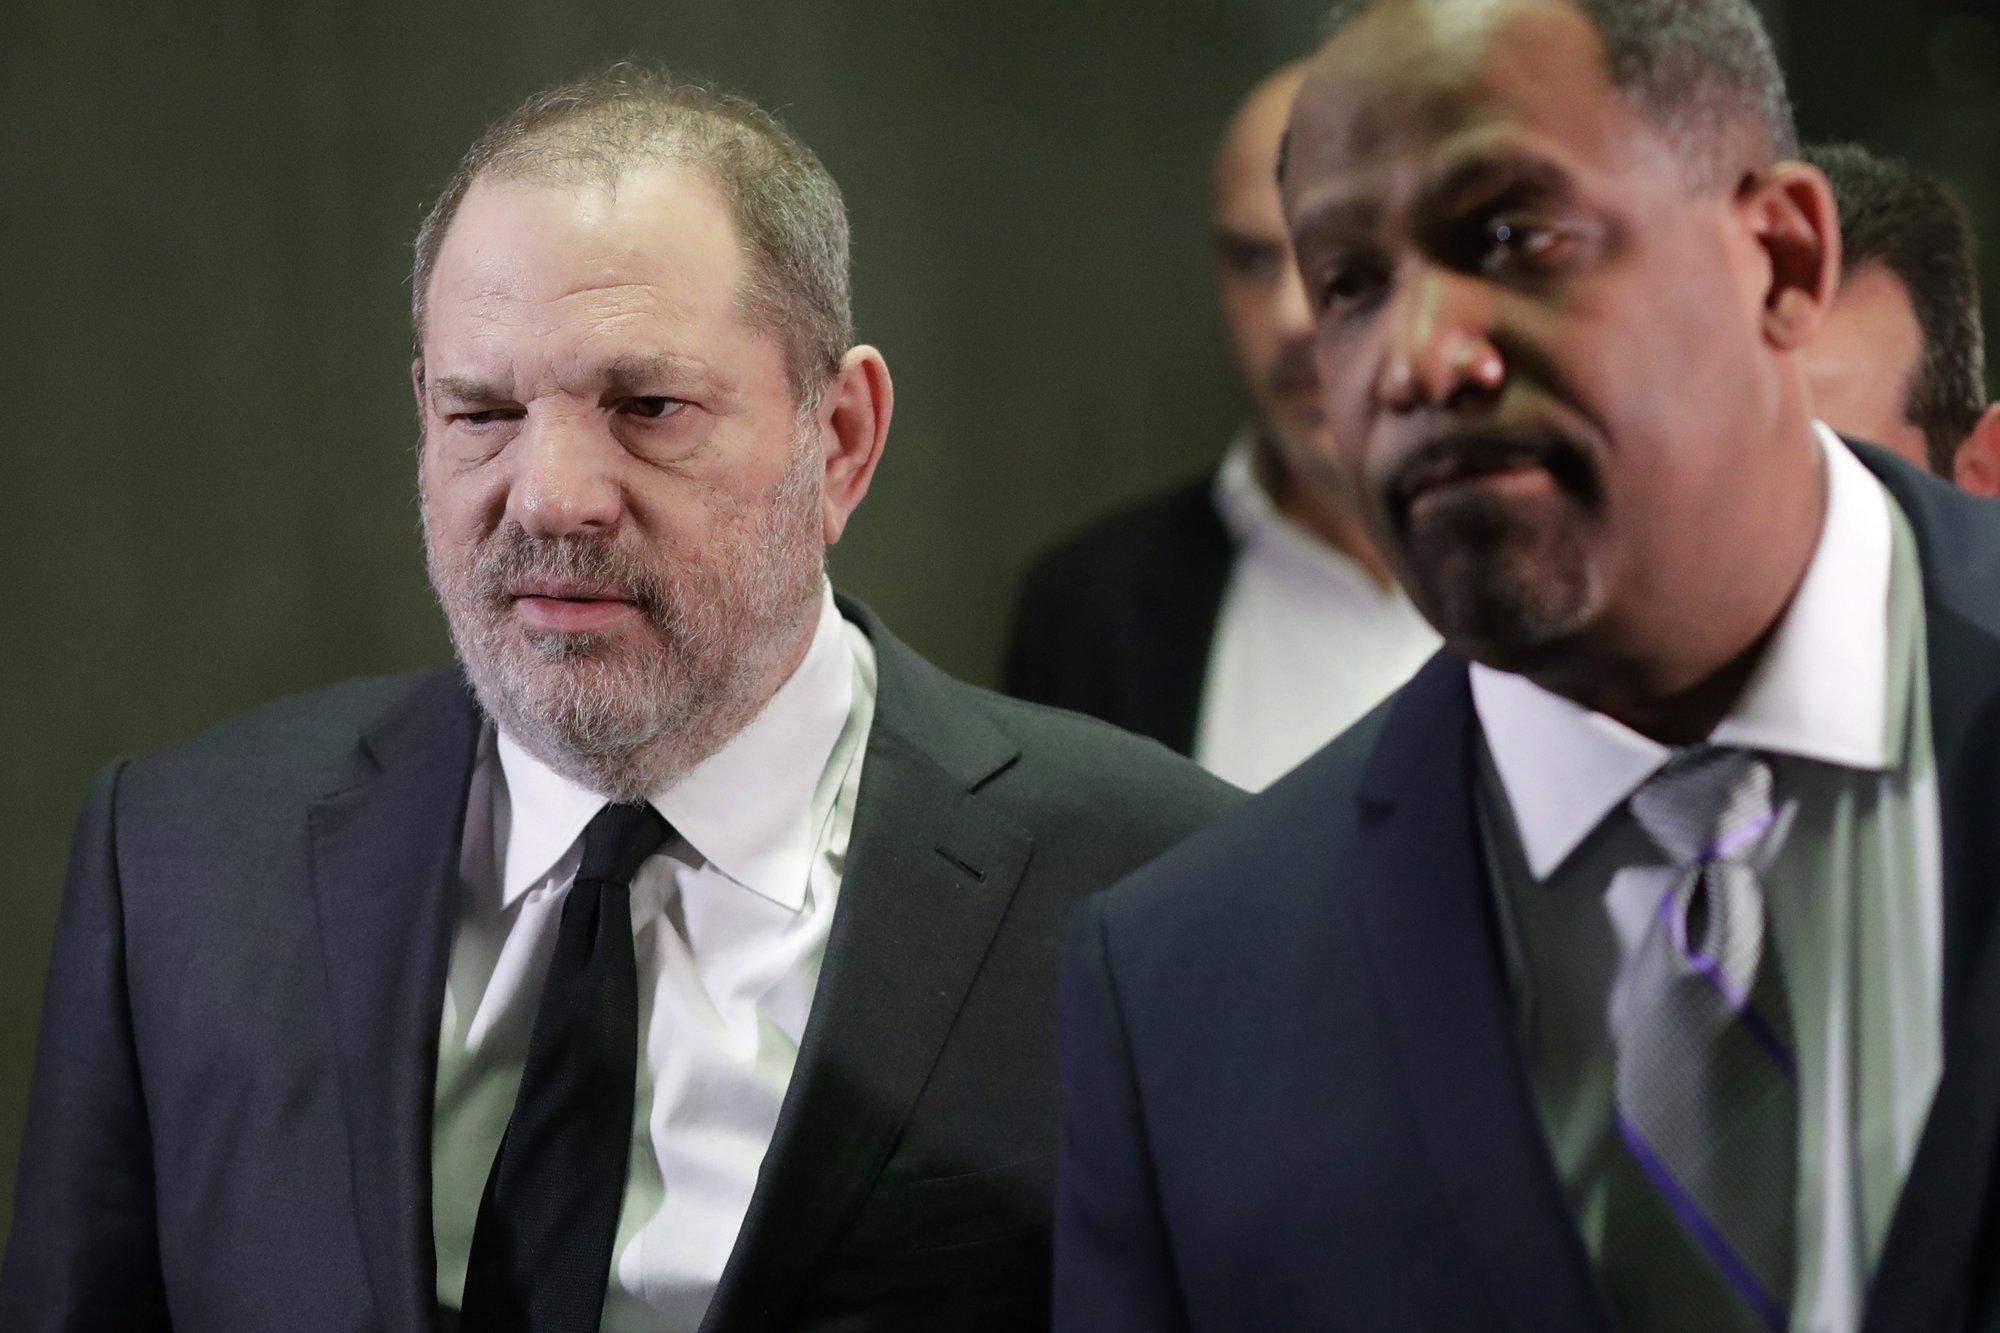 News groups fight to keep Harvey Weinstein's hearing open